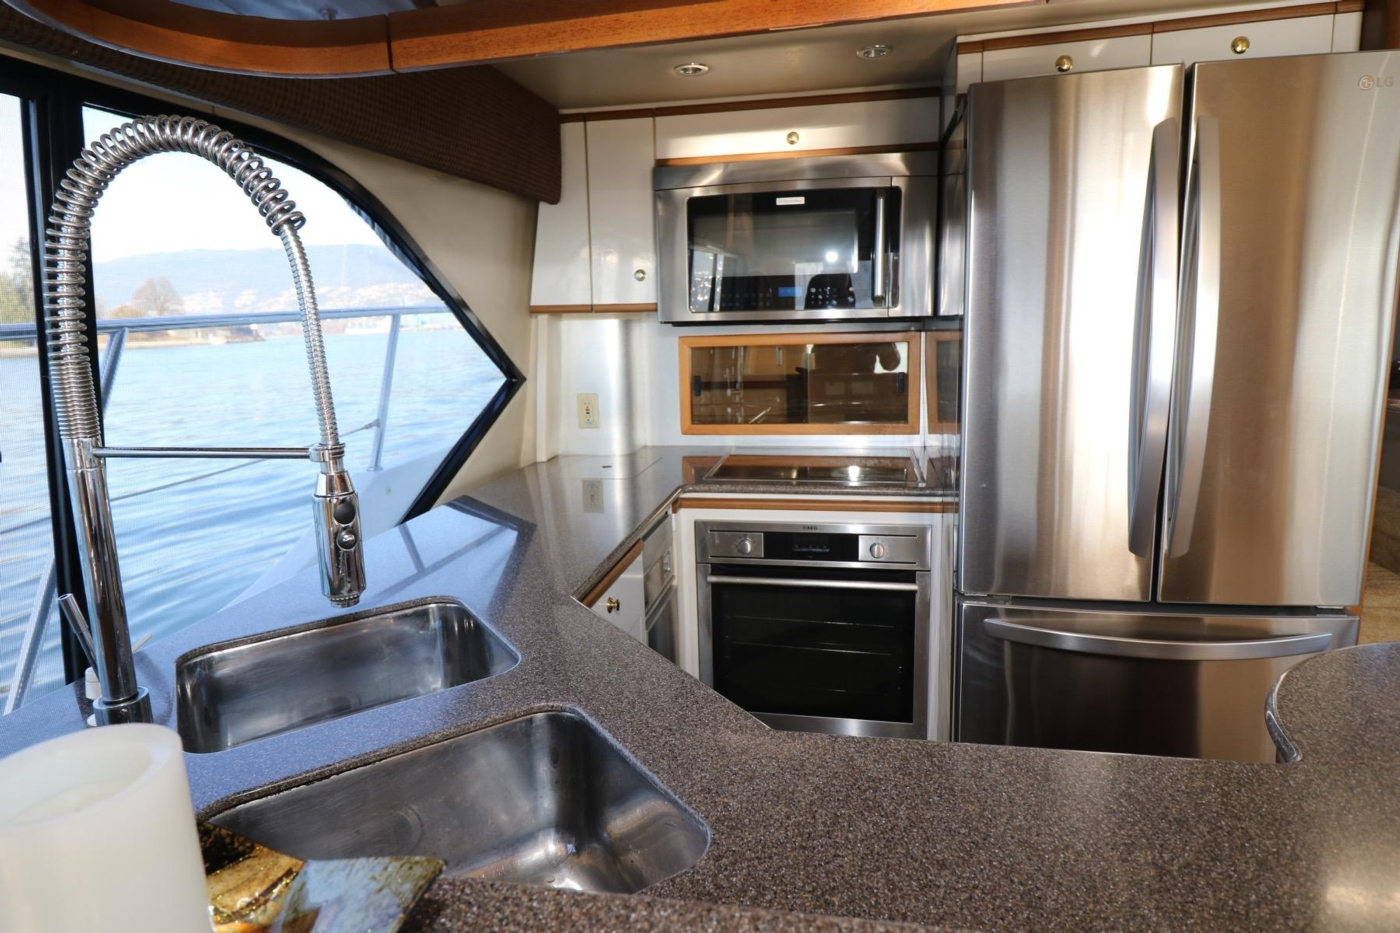 1999 Bayliner 5788 Pilot House Motoryacht, Stainless Sinks